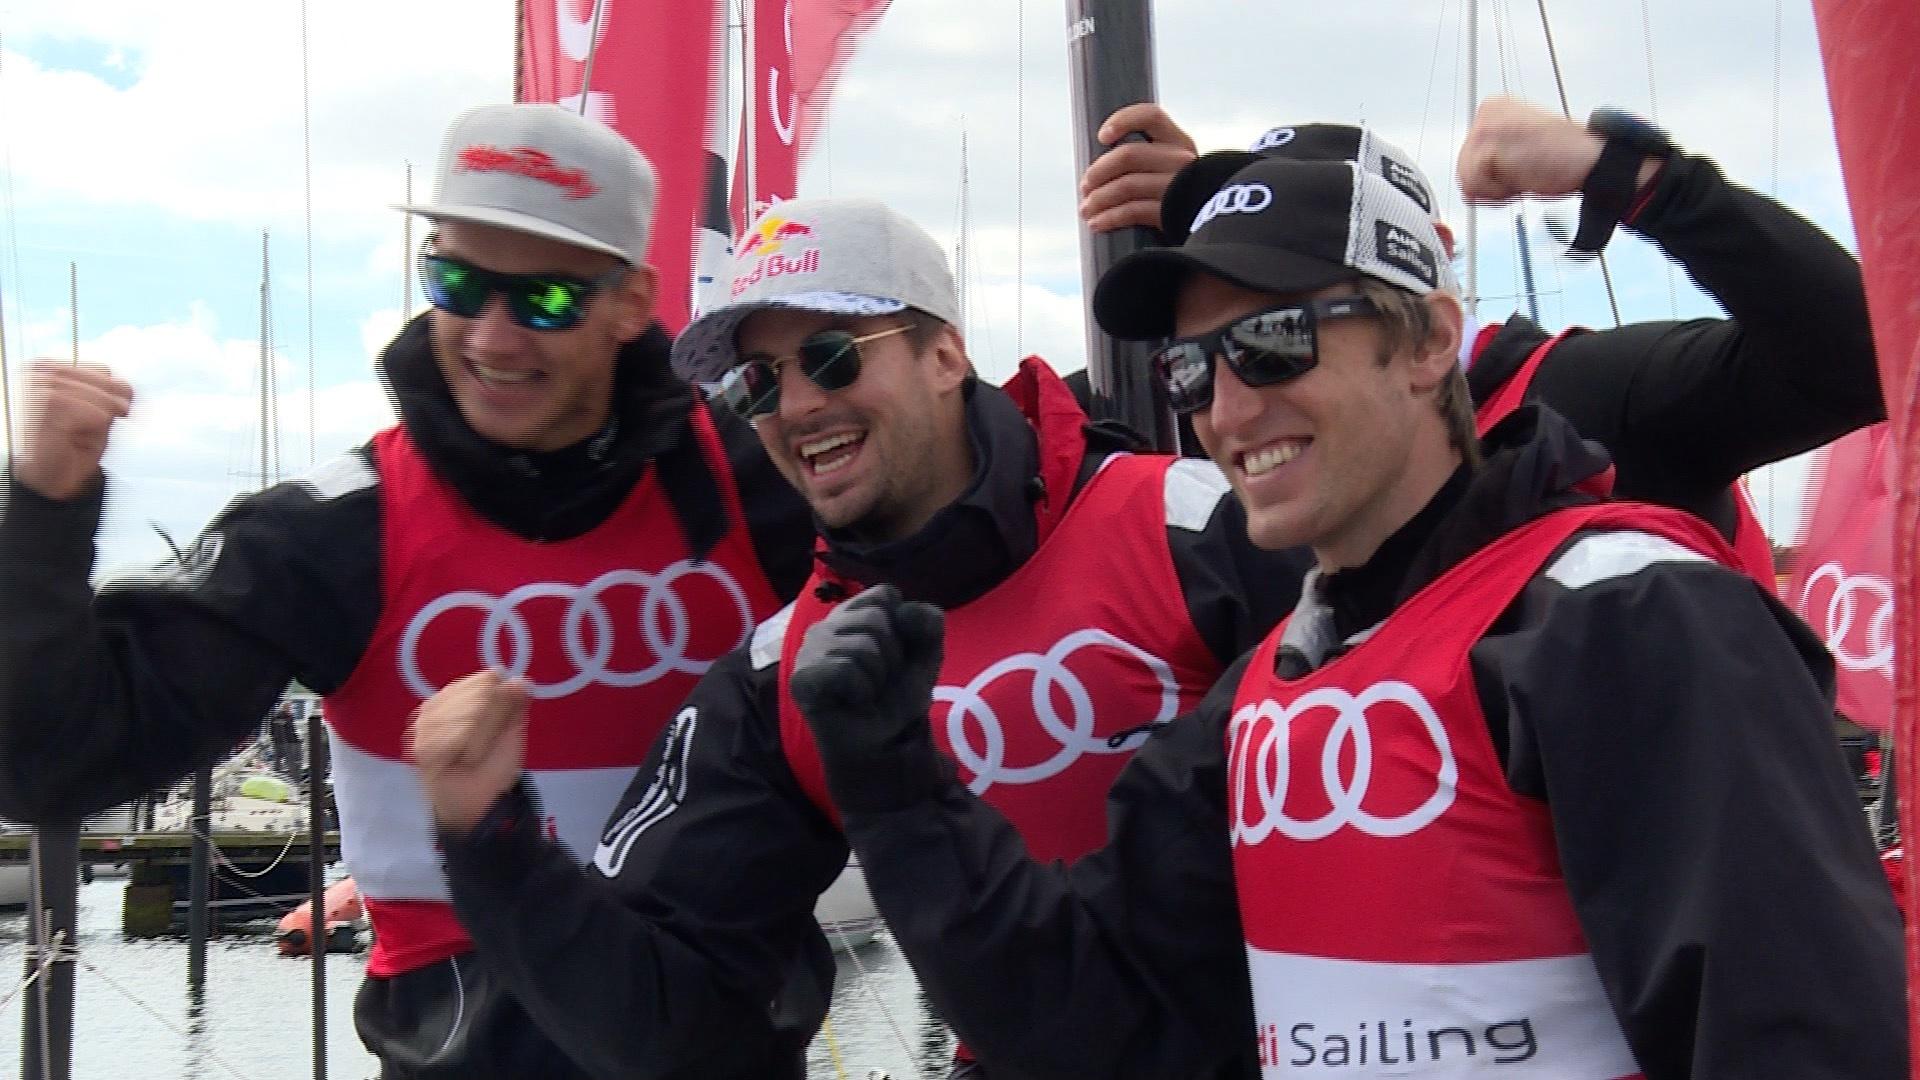 Audi e-tron Cup: Skirennläufer Fritz Dopfer bei der Kieler Woche